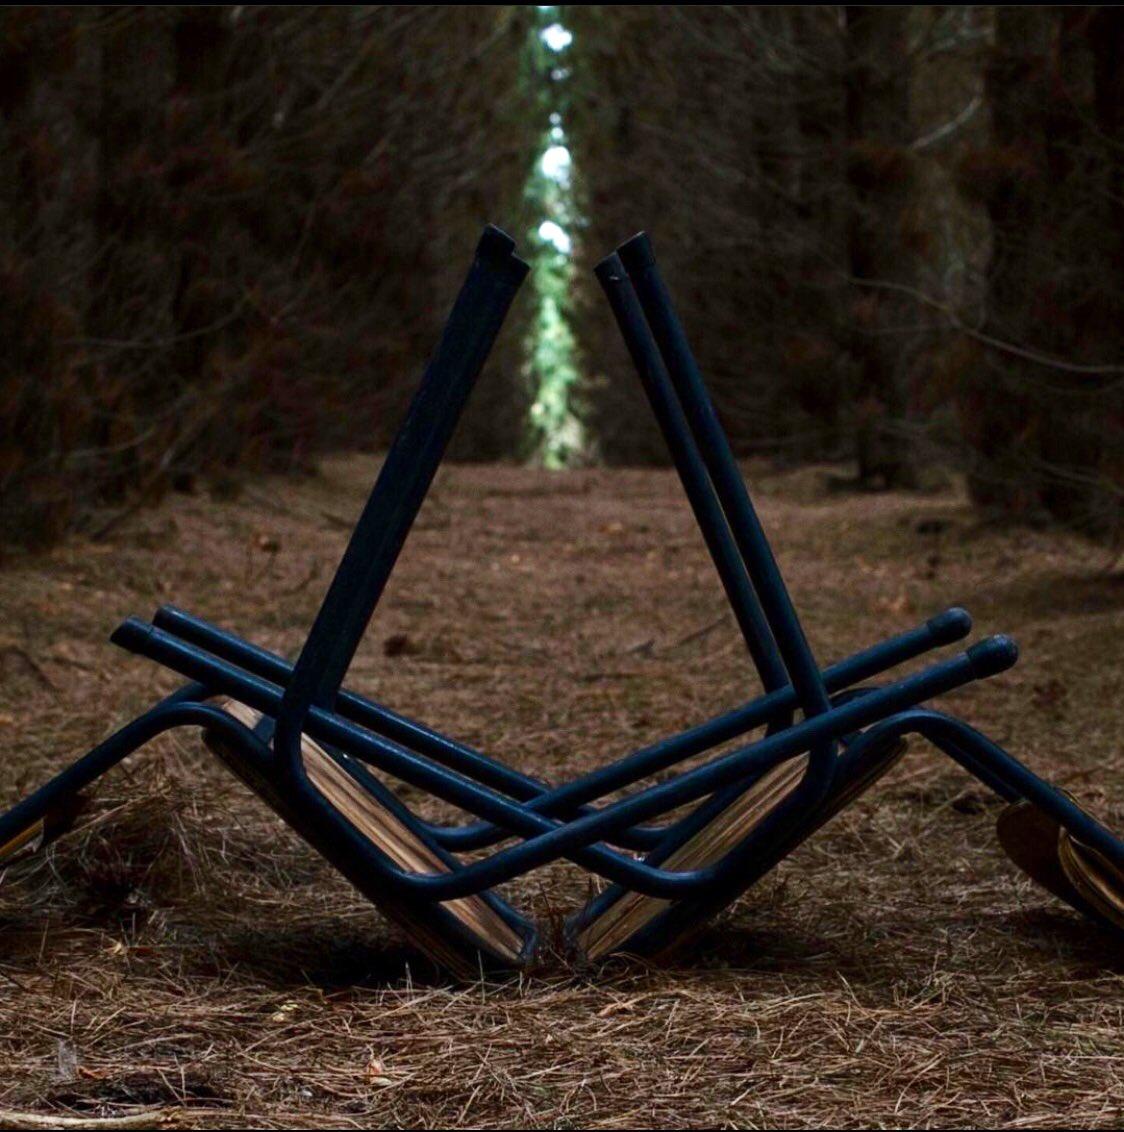 #Repost ・・・ CONVERSATION[S] collaboration in development w/ .@anastasia_lafey, Lucy Pijnenburg + Benjamin Hancock for the #3rdconversation : #soundart #worksinisolation #installationart #cinematography #contemporaryart #photodocumentation :